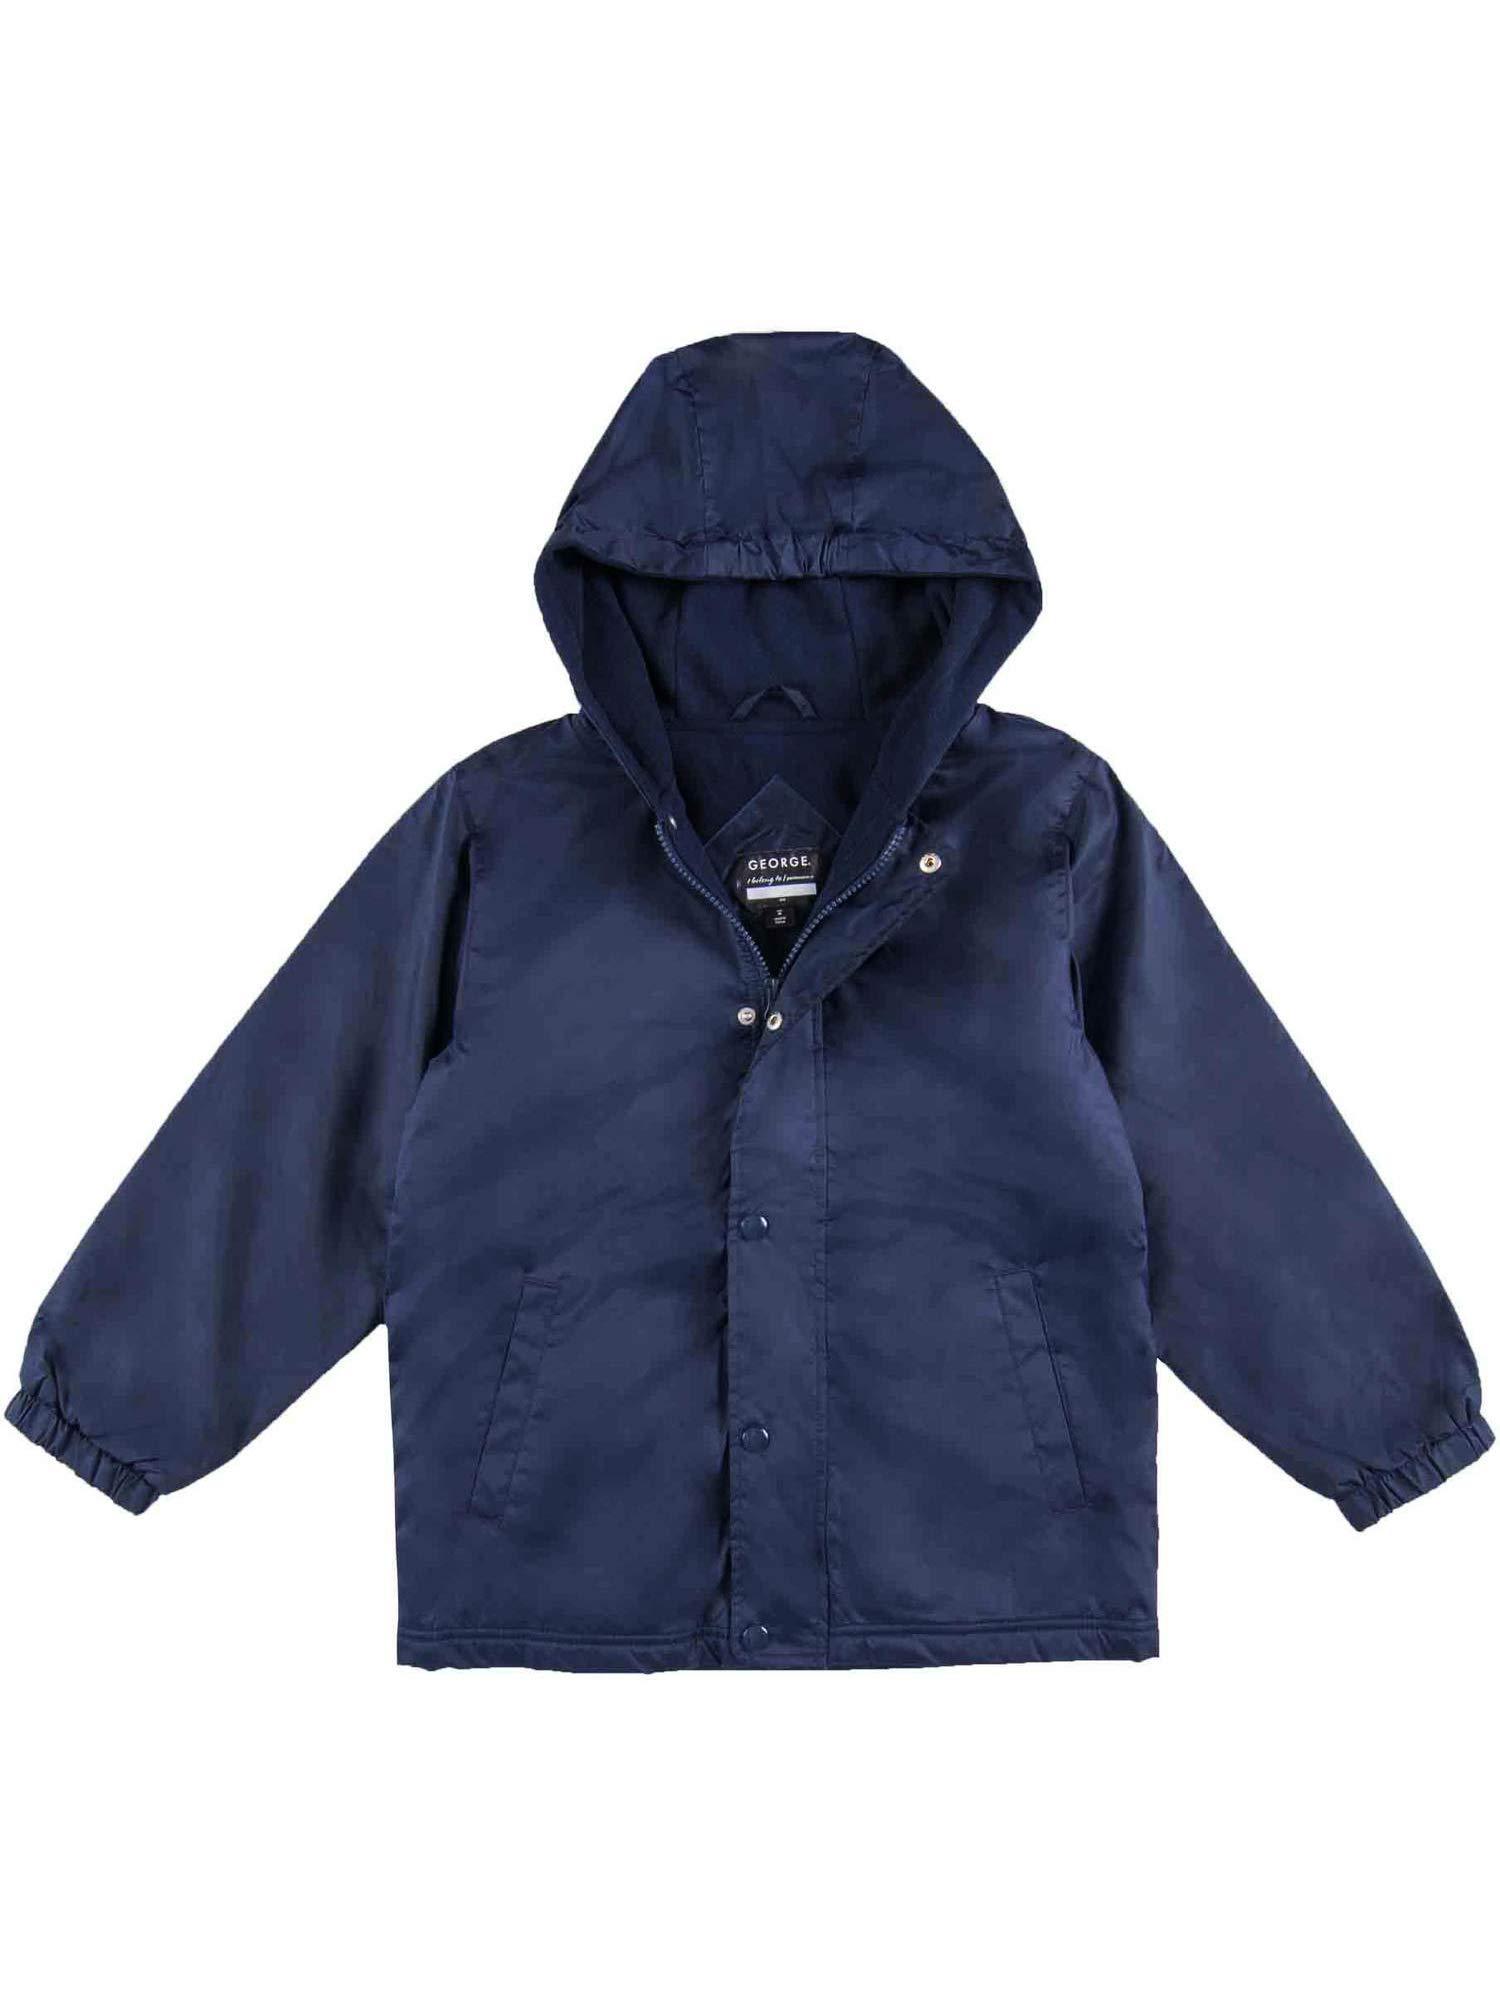 George School Uniform Boys Hooded Fleece Lined Jacket Size Large 10-12